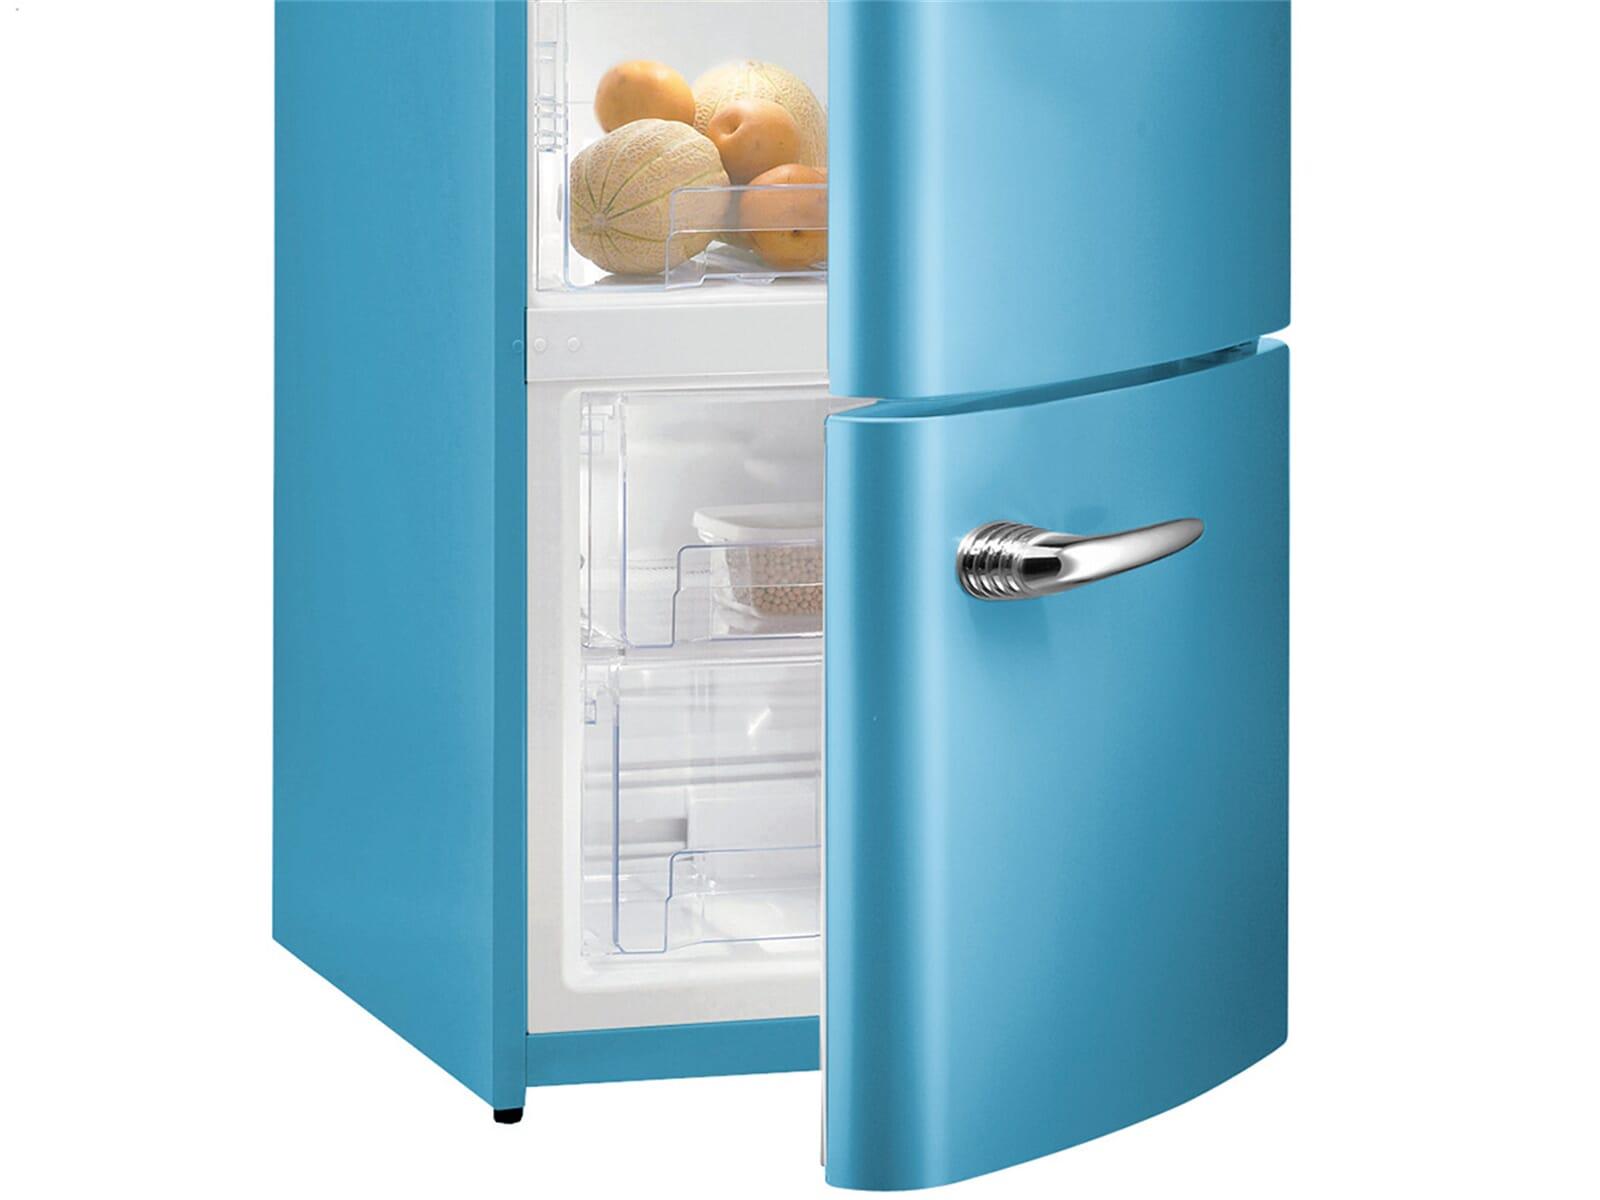 Gorenje Kühlschrank Blau : Gorenje rk obl kühl gefrierkombination baby blue